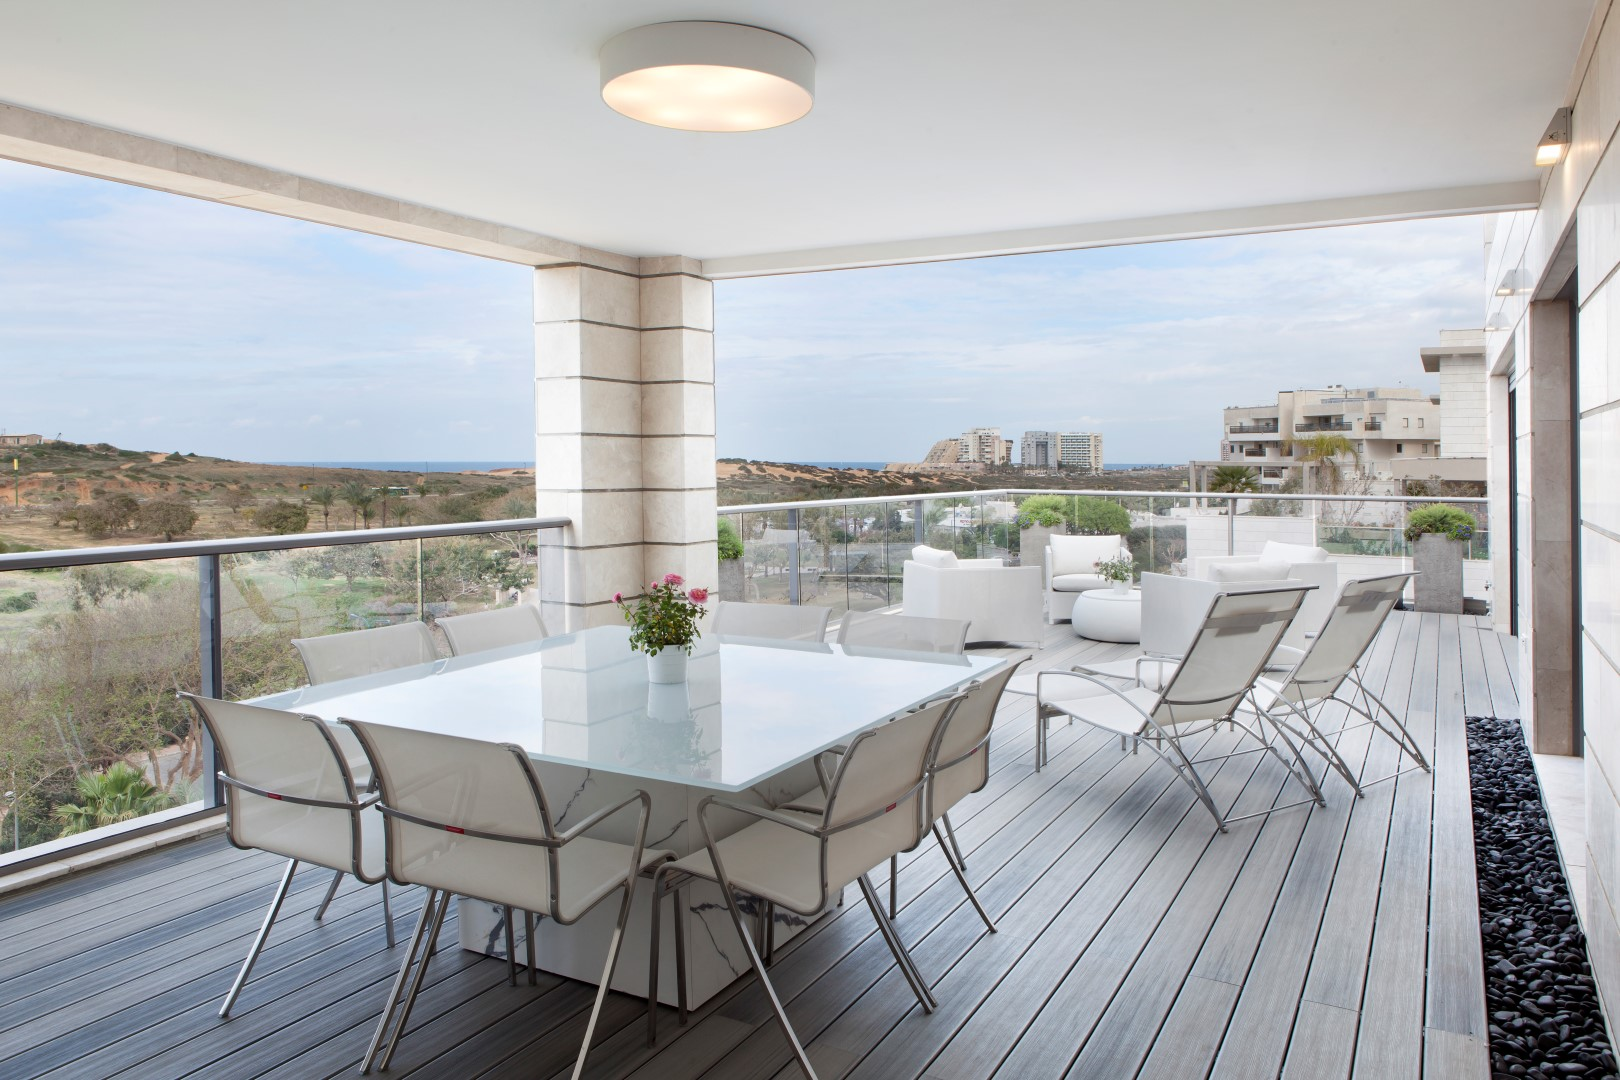 Azorei Chen Penthouse - Balcony 1